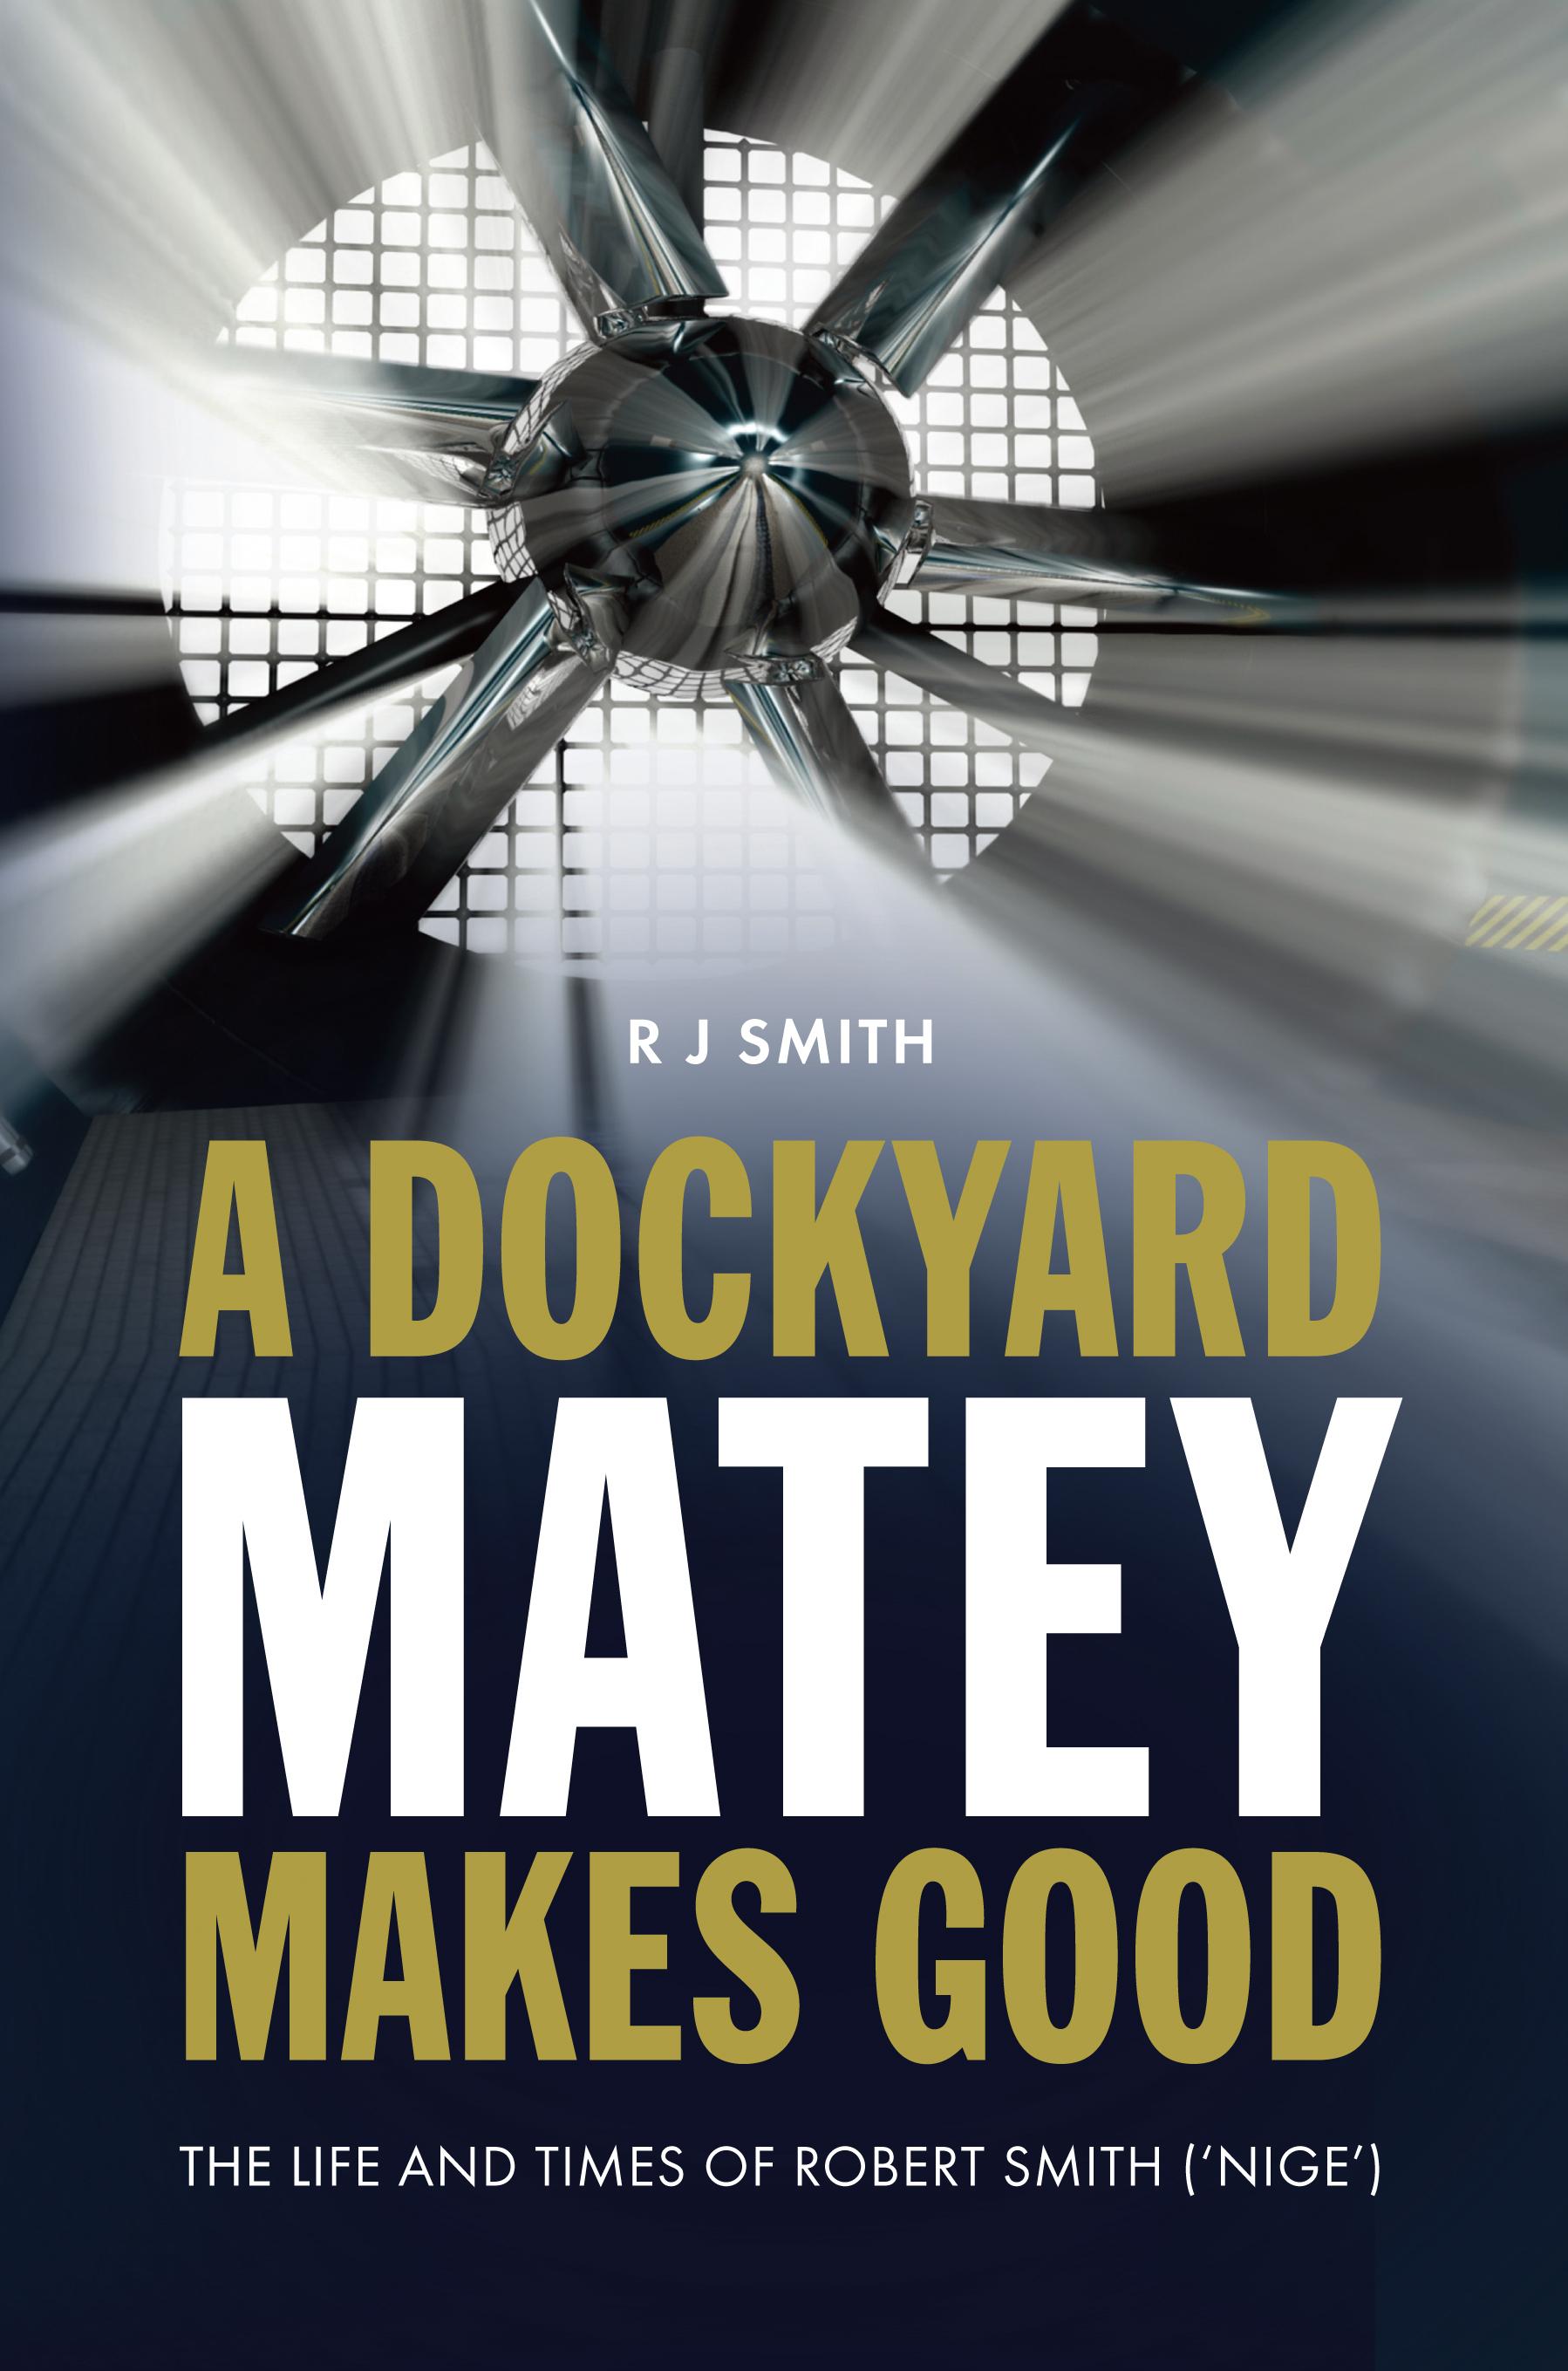 A Dockyard Matey makes Good  by  Robert Smith